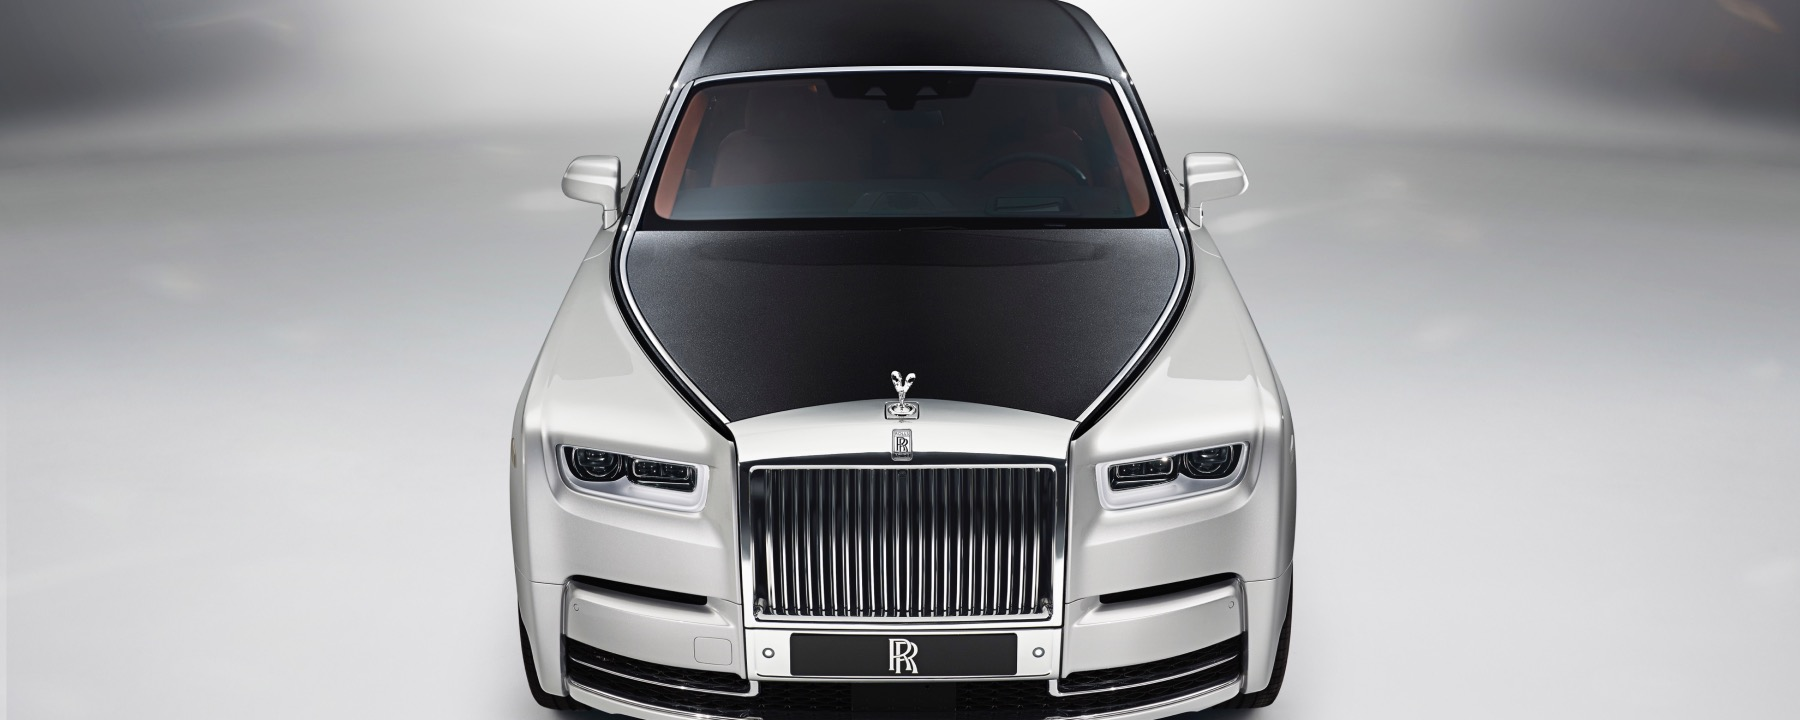 Rolls Royce Rancho Mirage Blog Rolls Royce Rancho Mirage Blog